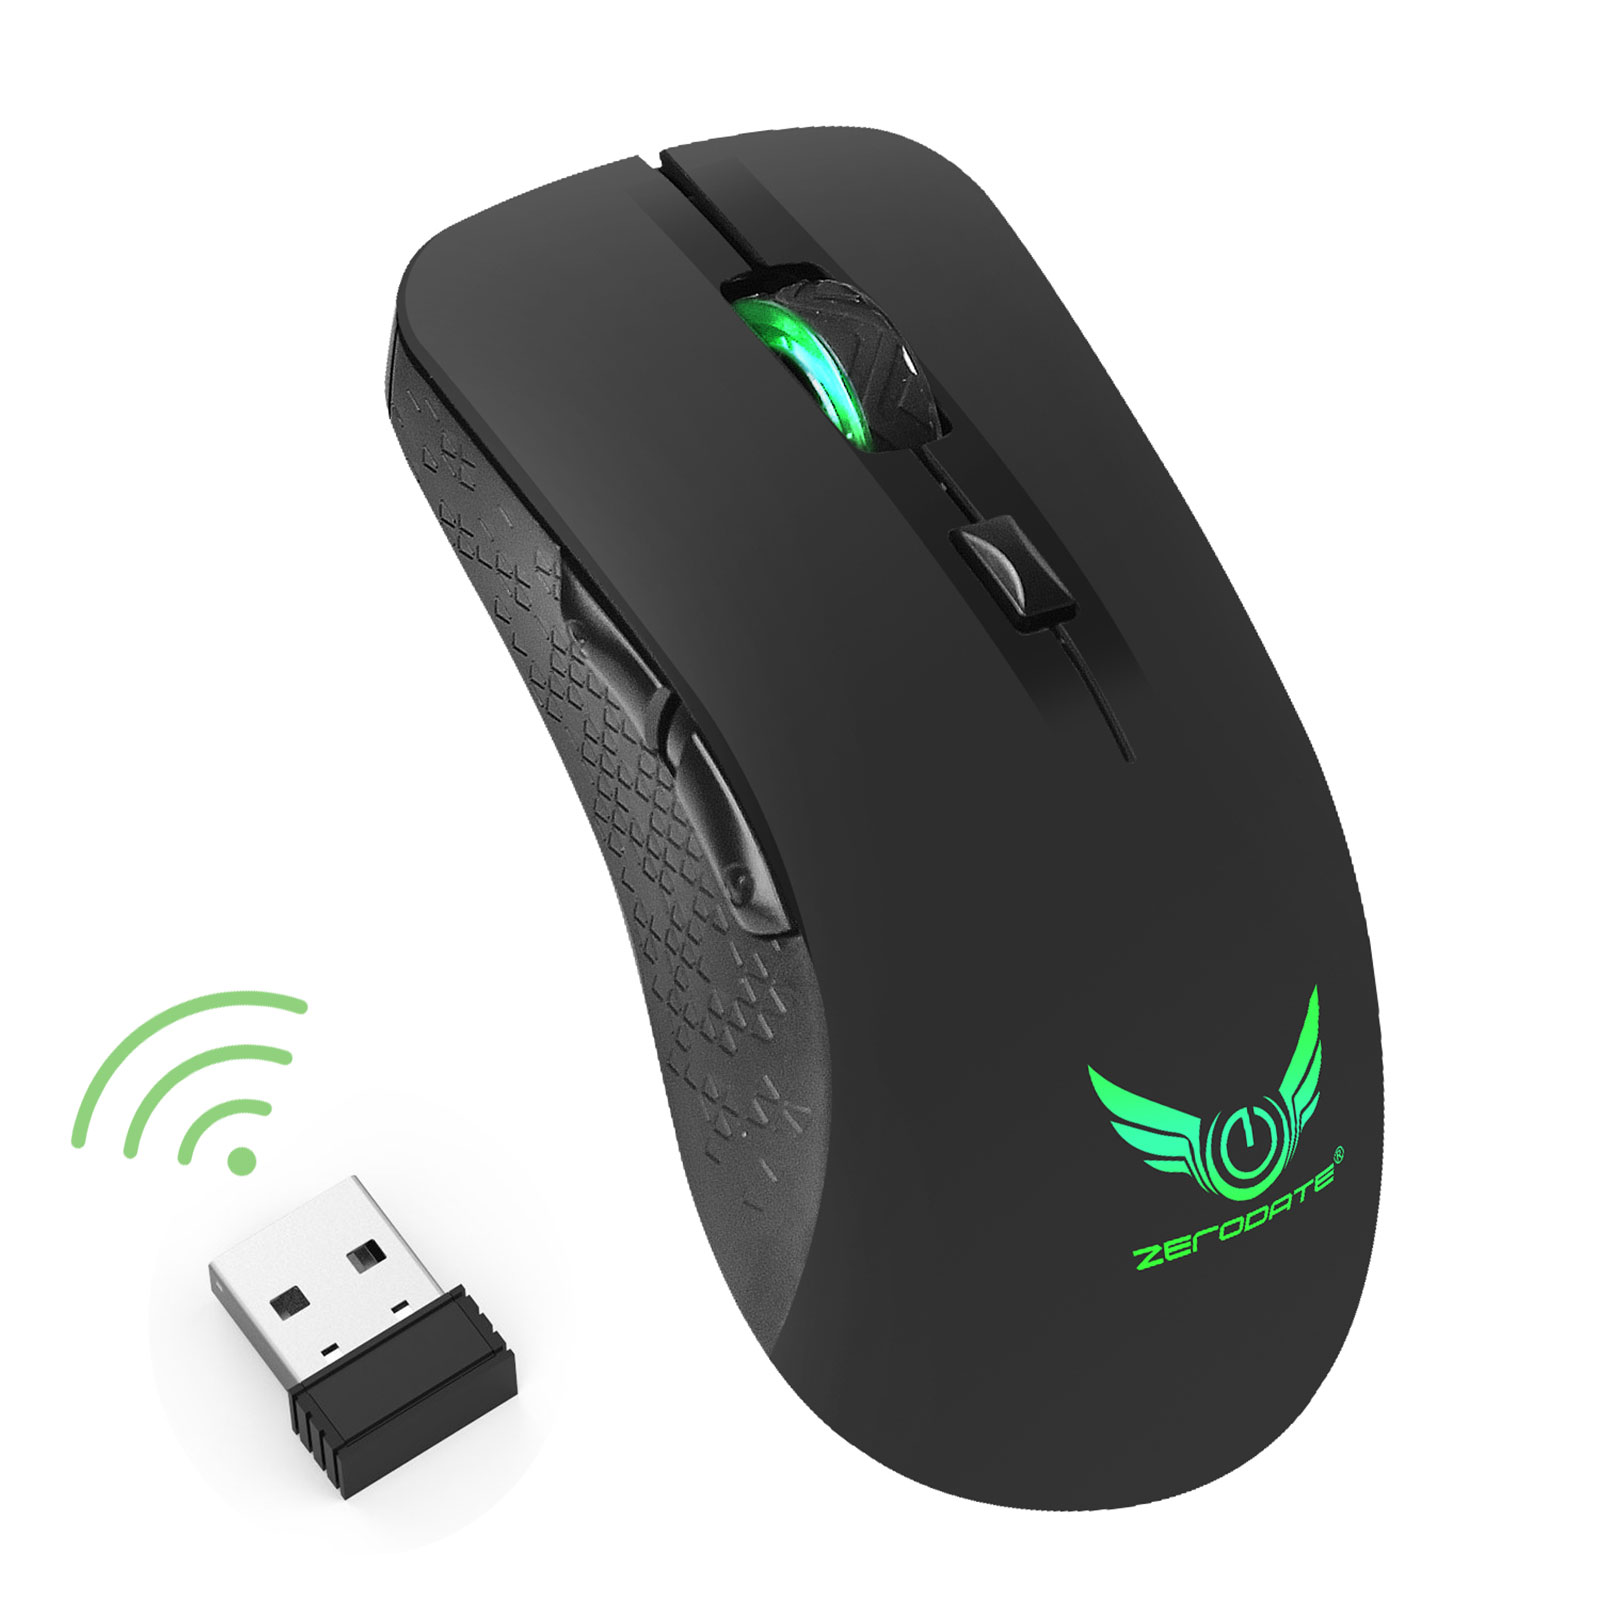 TSV X90 2.4GHz Wireless Optical Mouse &USB Receiver Adjustable DPI for PC Desktop Laptop